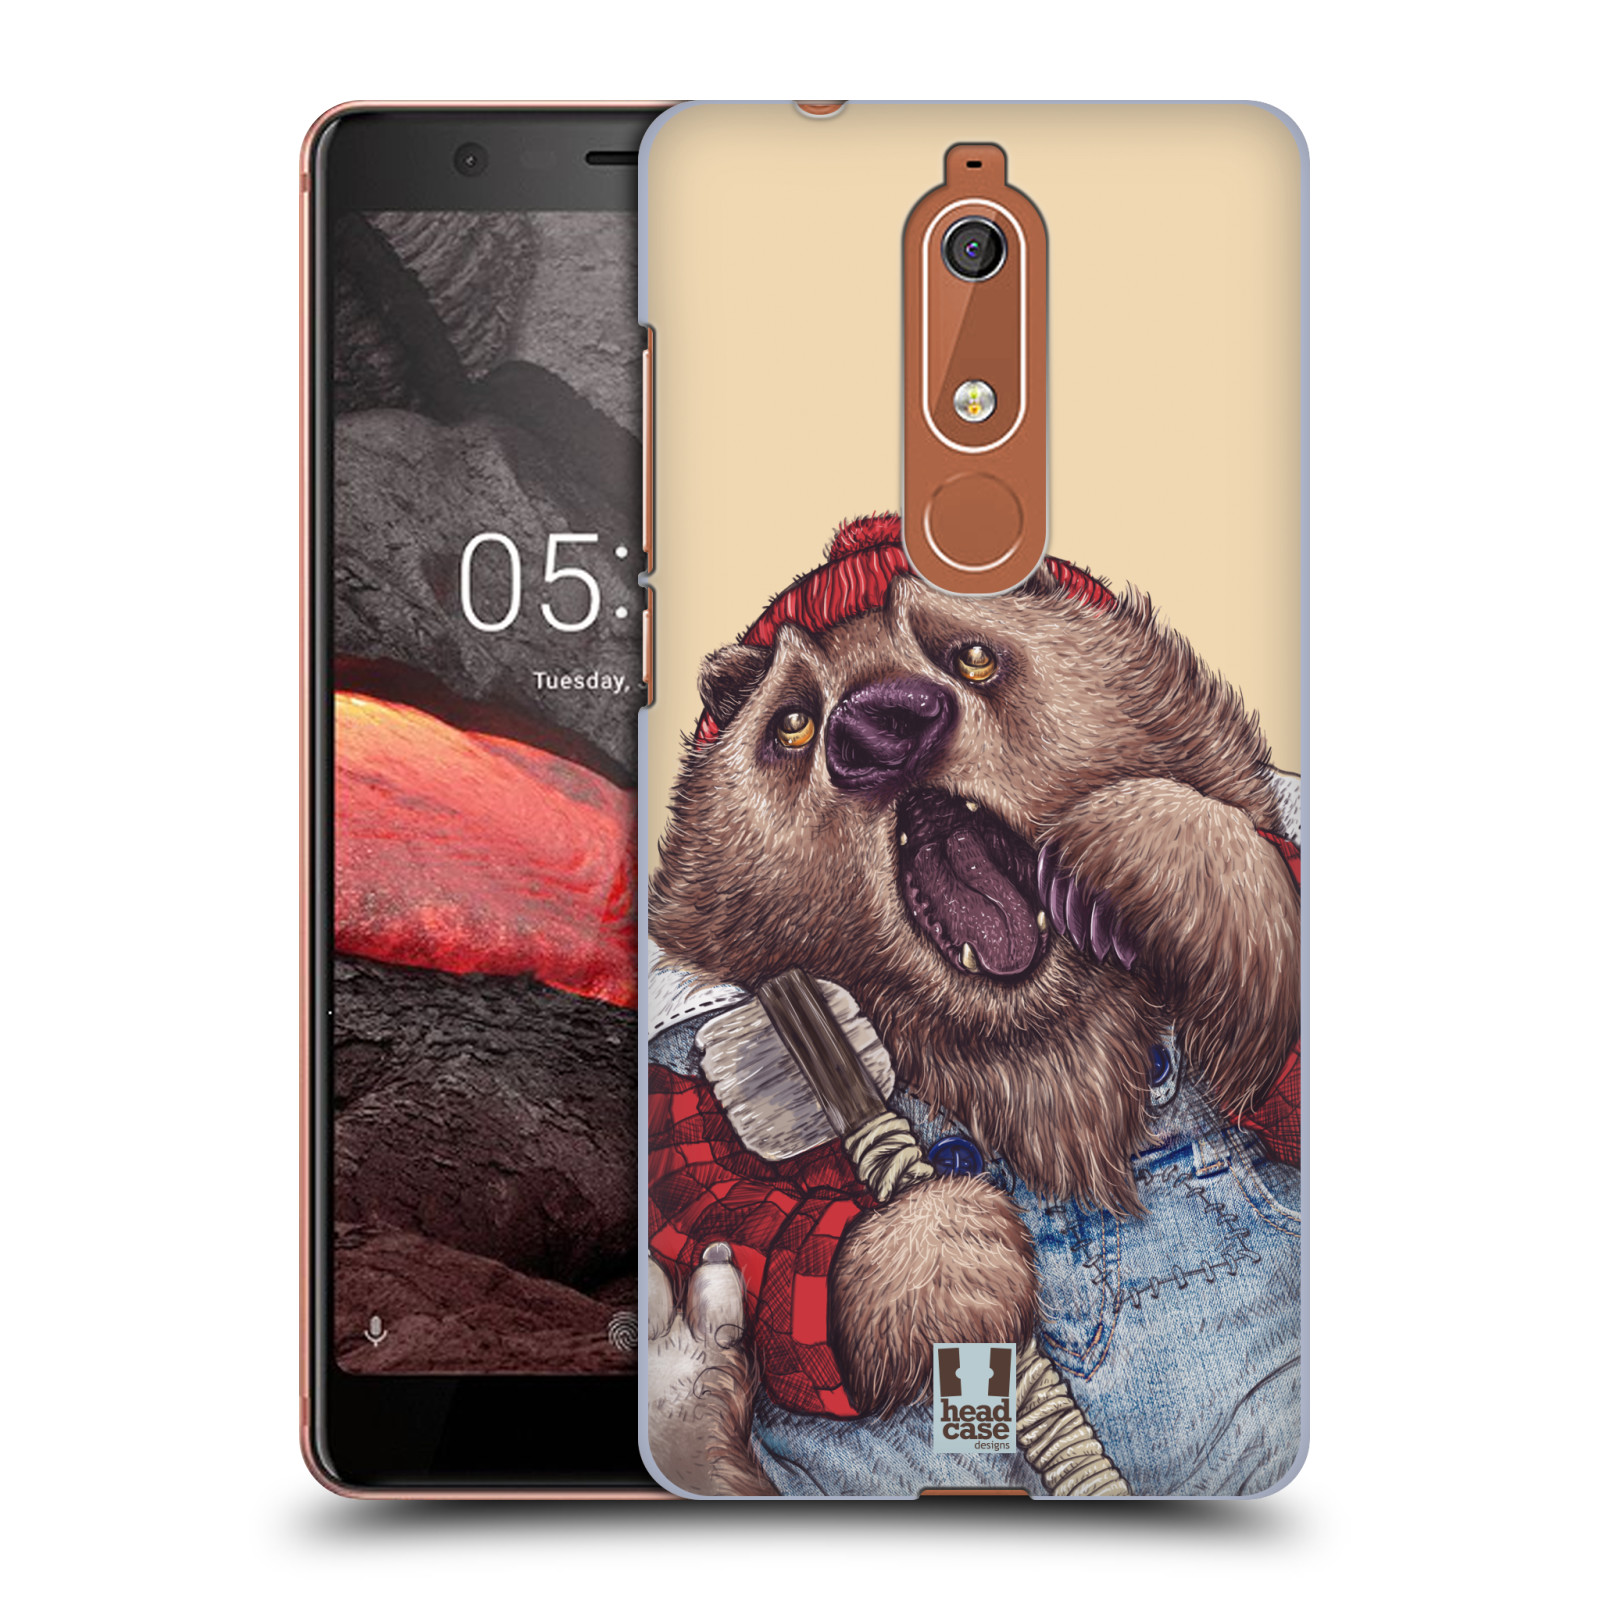 Plastové pouzdro na mobil Nokia 5.1 - Head Case - ANIMPLA MEDVĚD